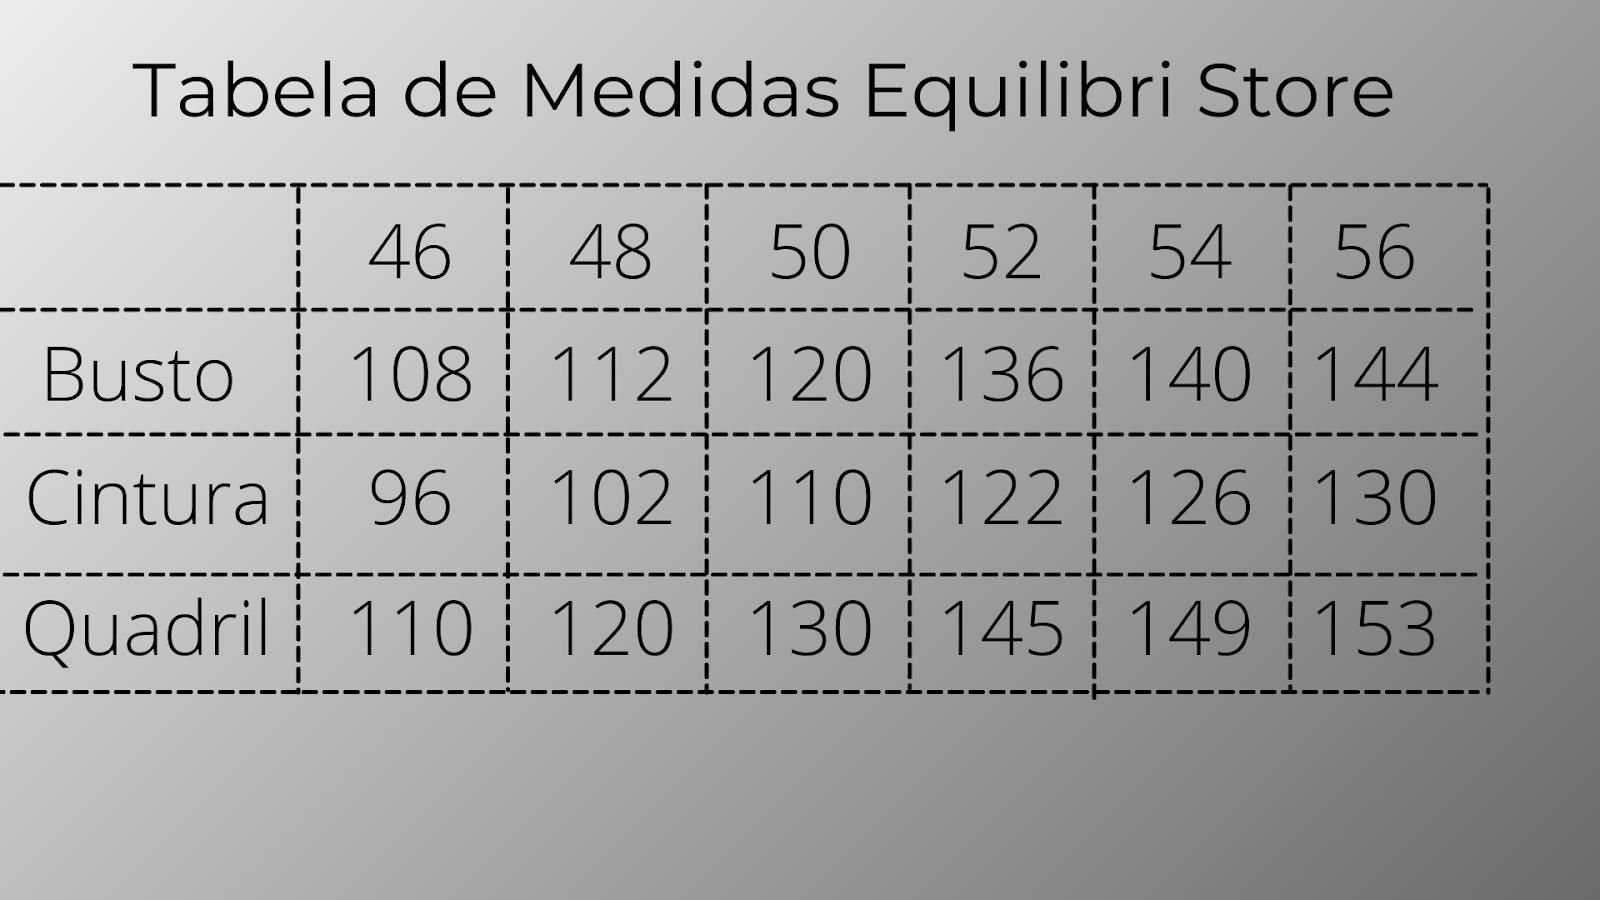 Tabela de medidas Equilibri Store